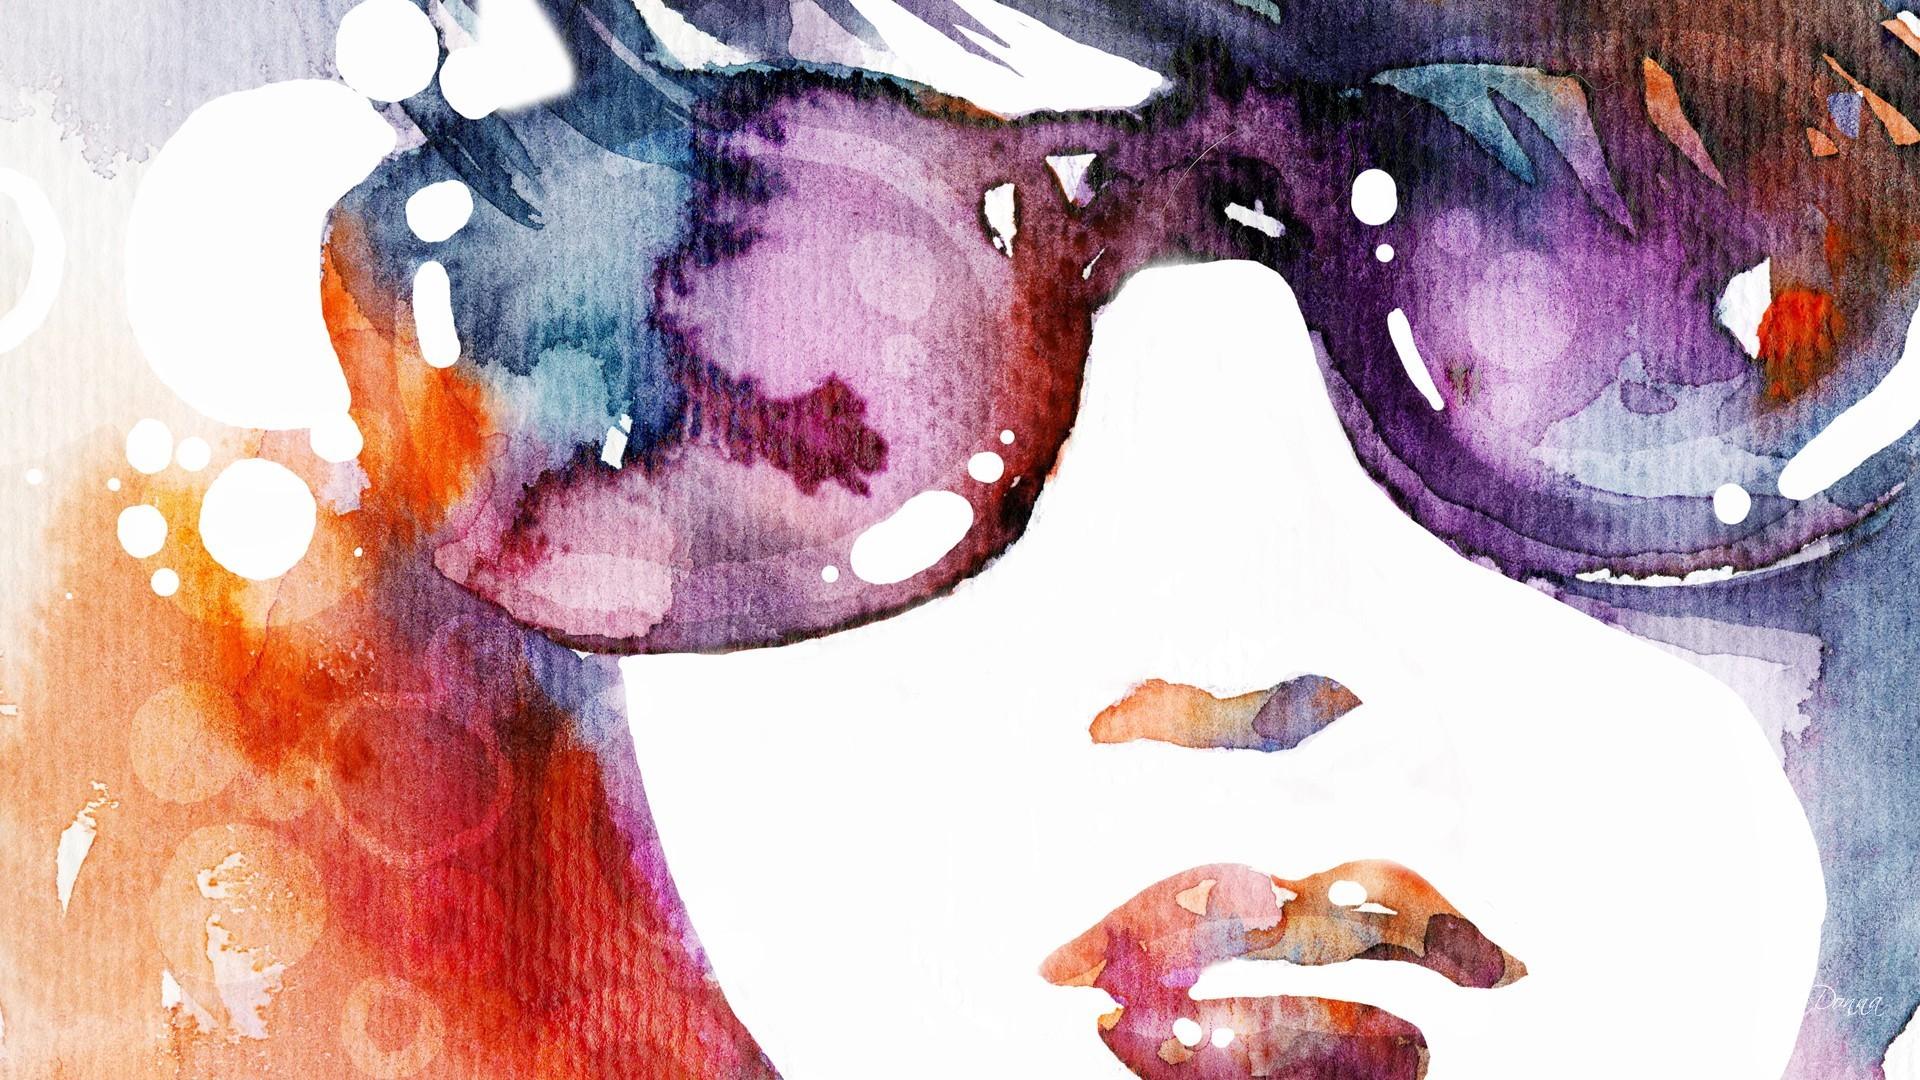 53f0b30ca34 Wallpaper : painting, illustration, sunglasses, anime, glasses ...